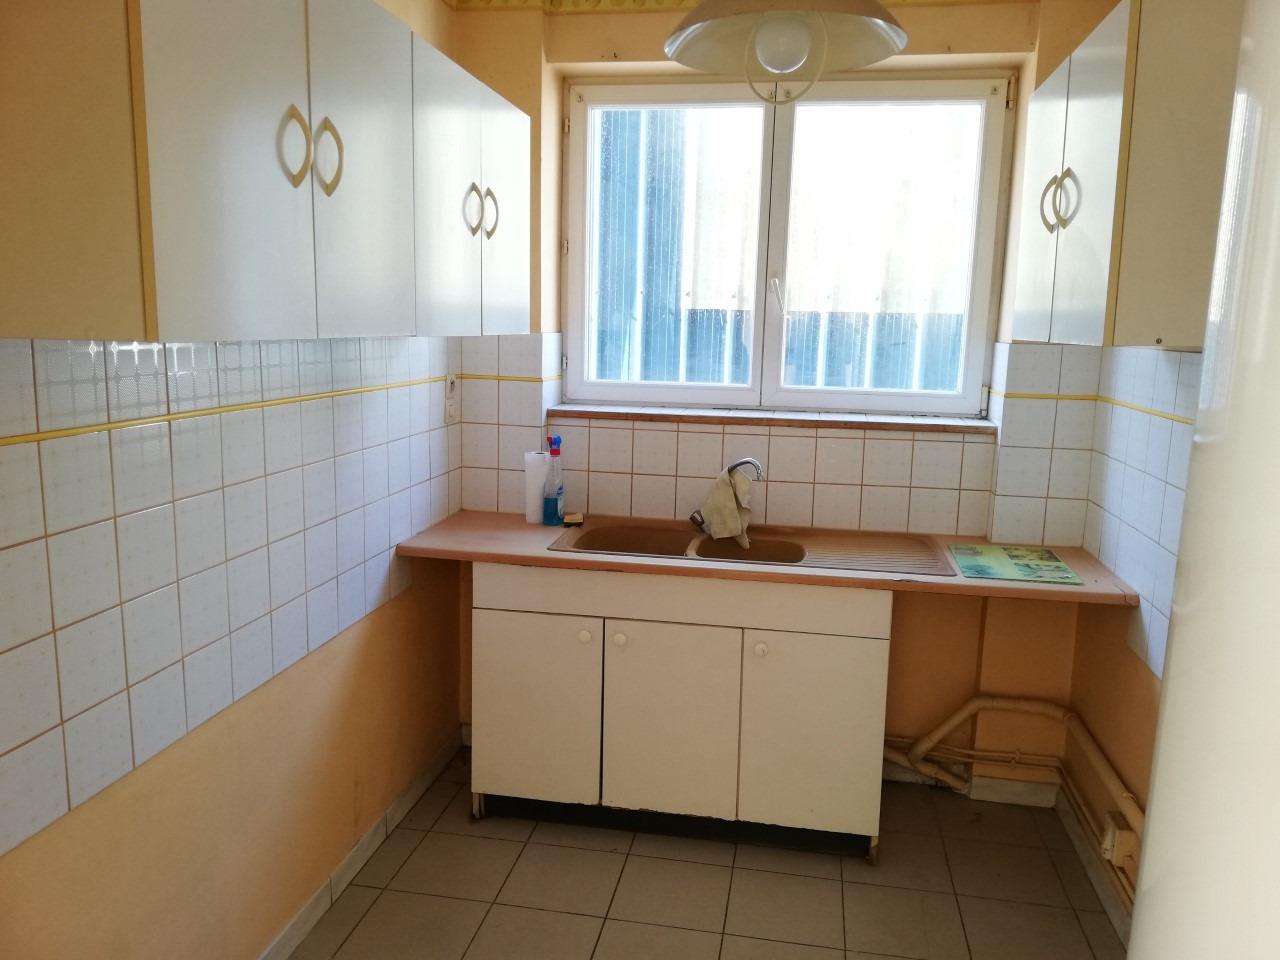 vente boulogne sur mer appartement 50 m 3 pi ces. Black Bedroom Furniture Sets. Home Design Ideas